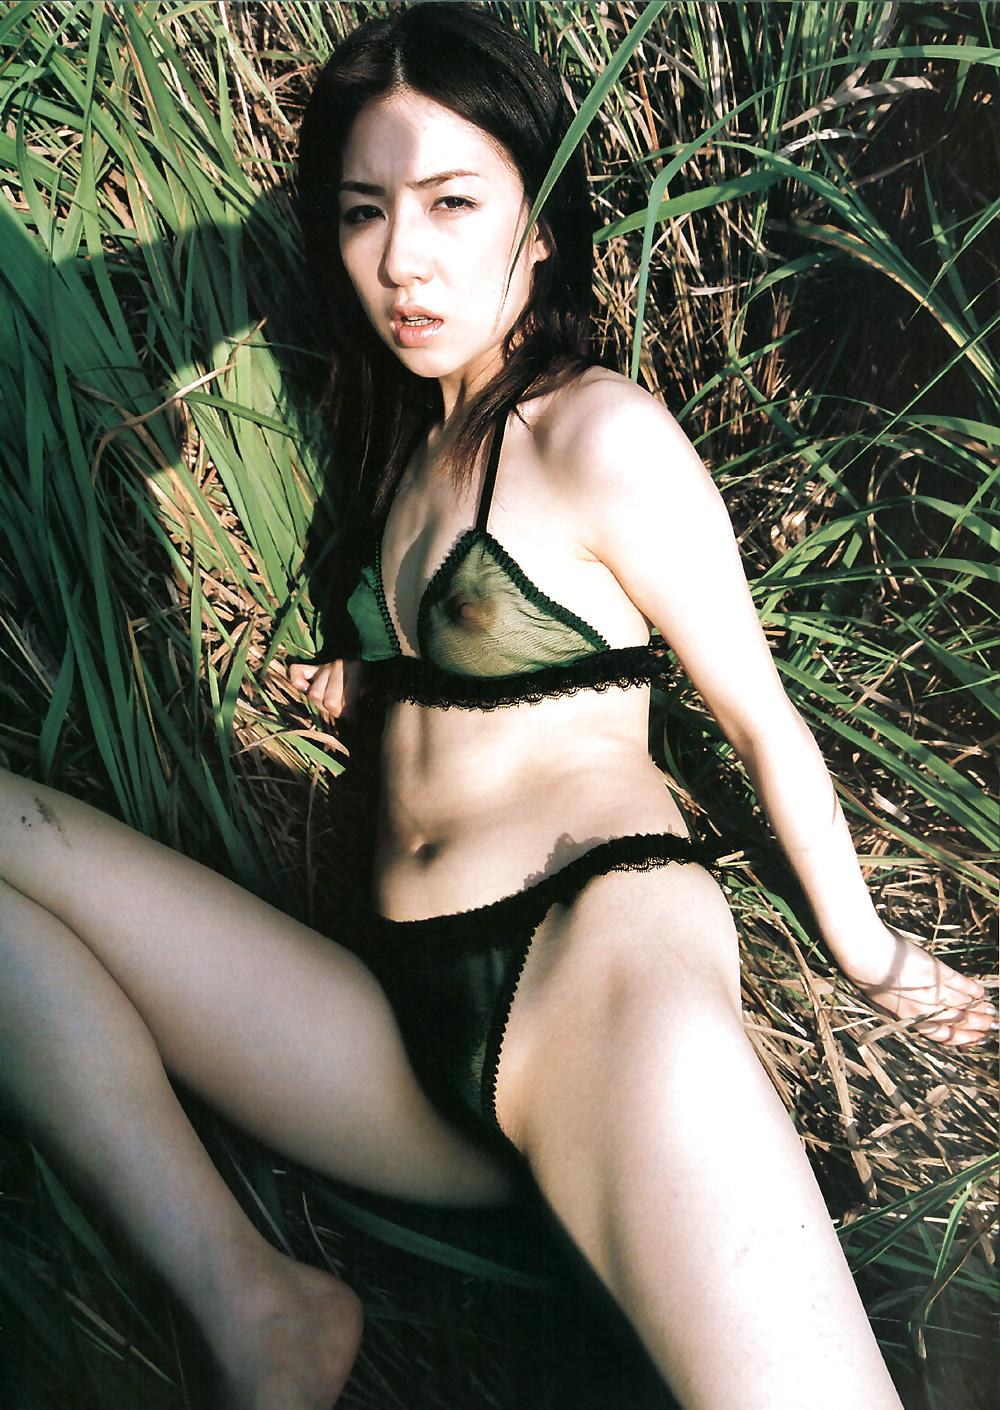 Schamlose asiatische Muschis in umsonsten Bildern